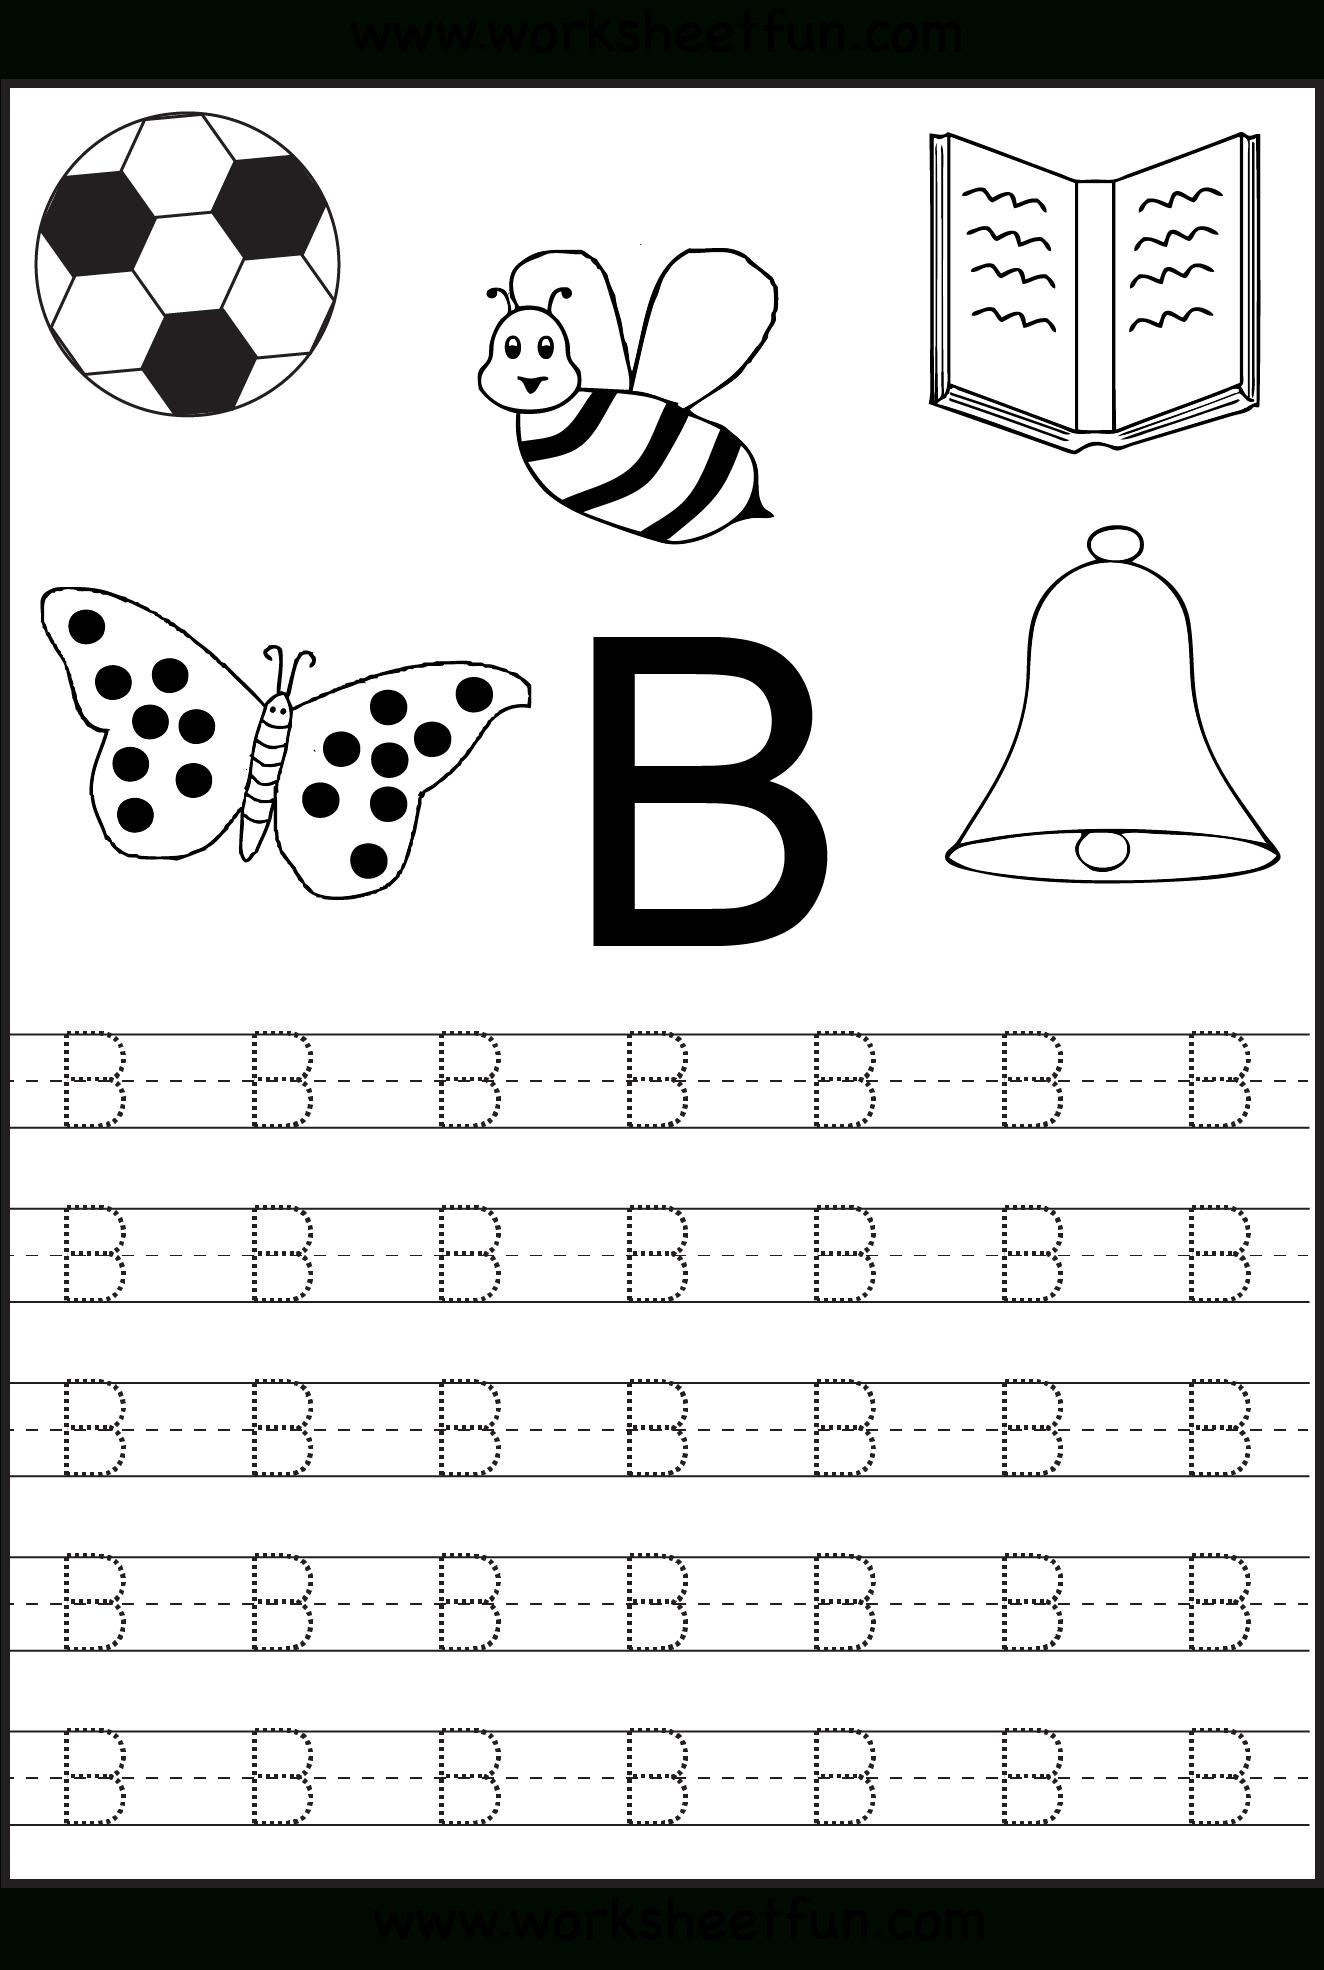 Free Printable Letter Tracing Worksheets For Kindergarten regarding Free Printable Alphabet Tracing Letters